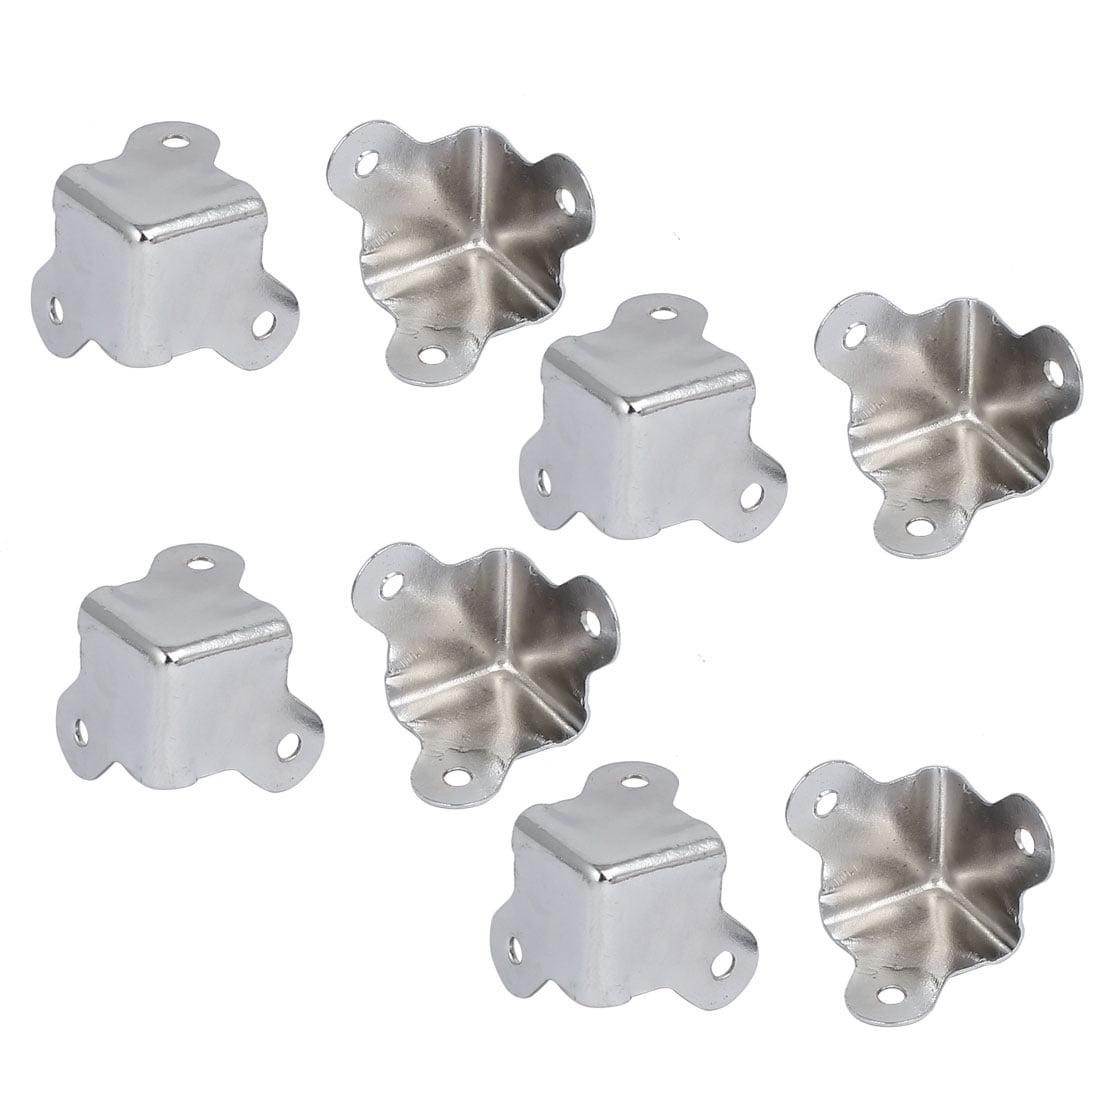 Wooden Case Jewelry Box Metal Edge Corner Protectors Covers 23mmx16mm 8pcs